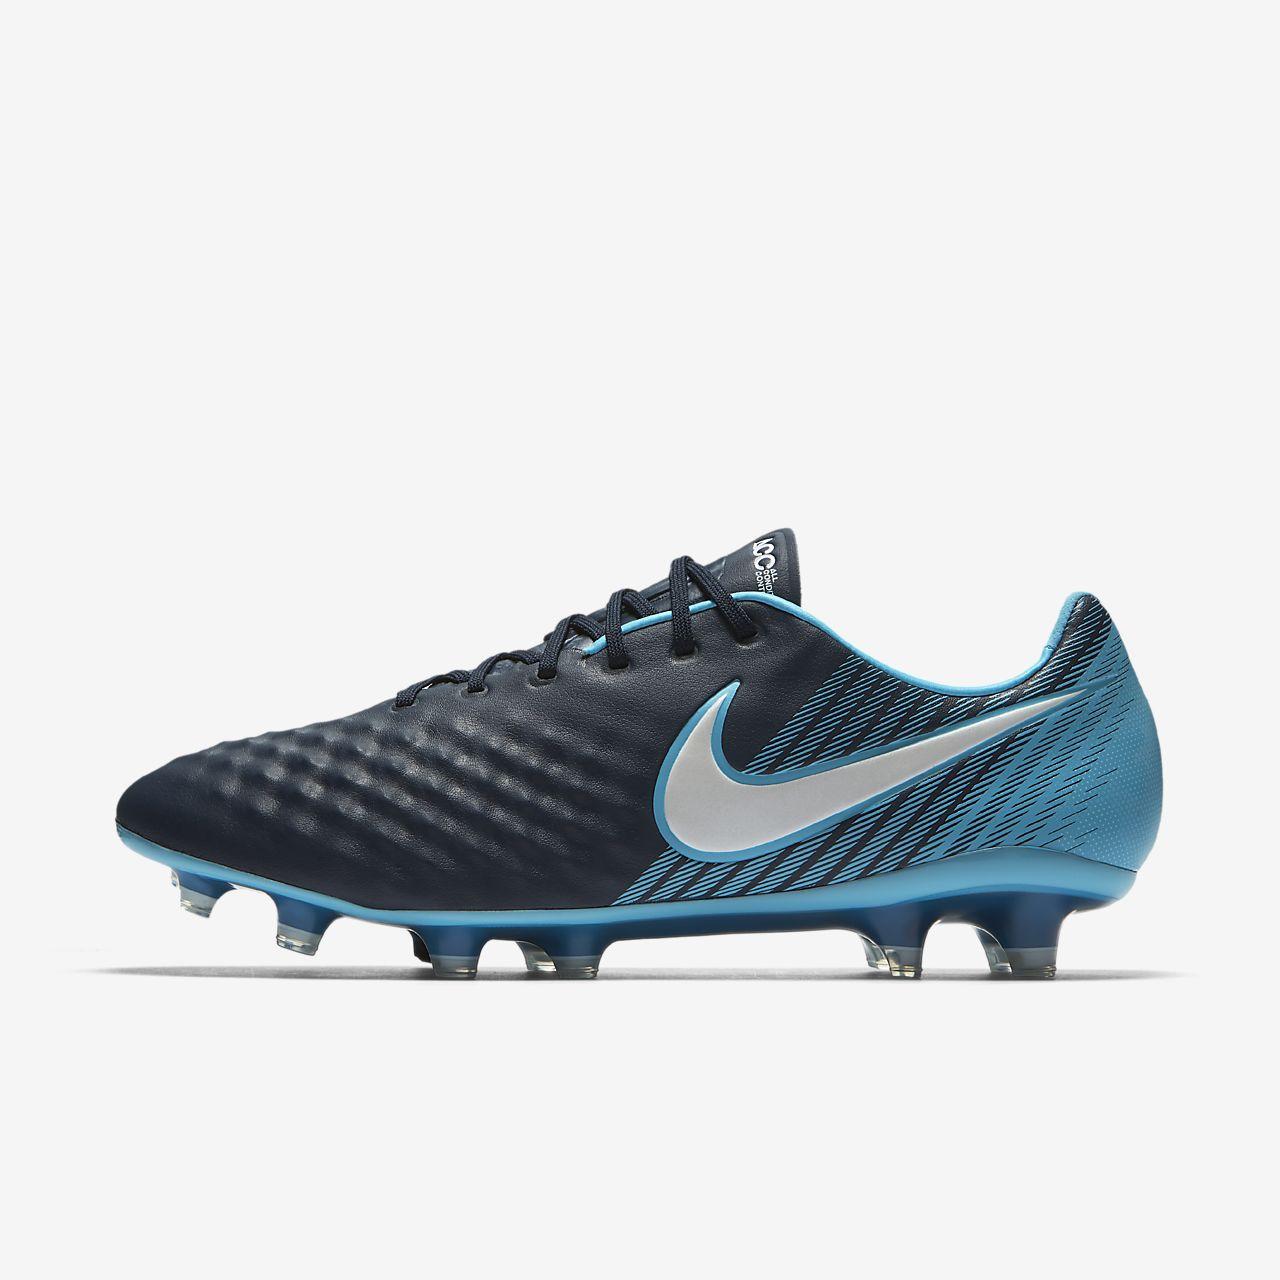 misure scarpe da calcio nike